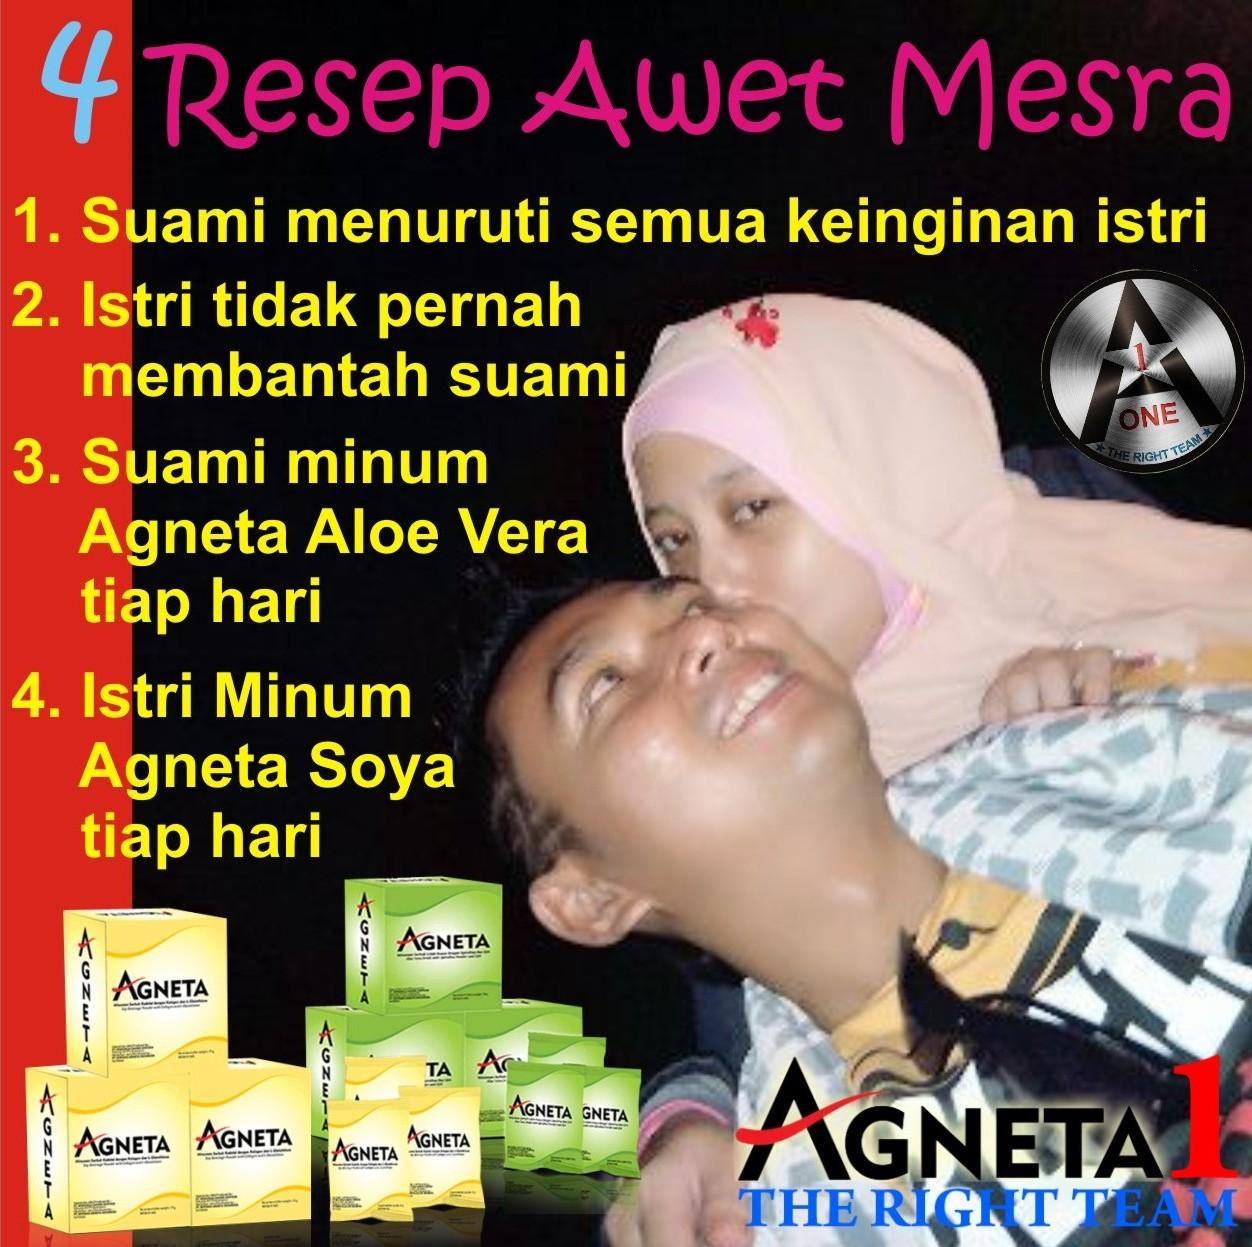 Resep Awet Mesra Ala Agneta